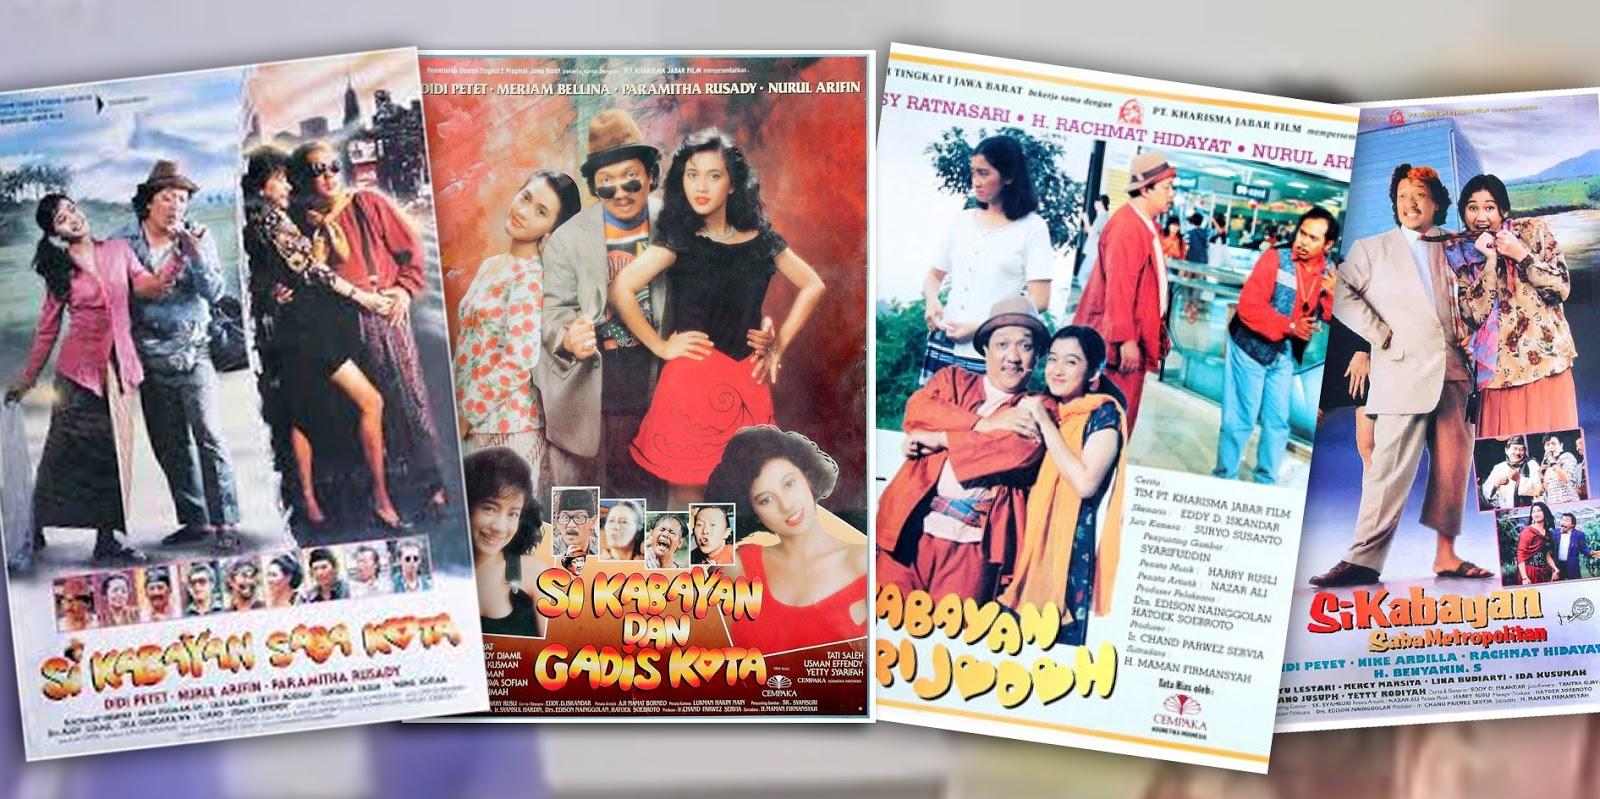 Latar tempat di Bandung dalam film si Kabayan Didi Petet